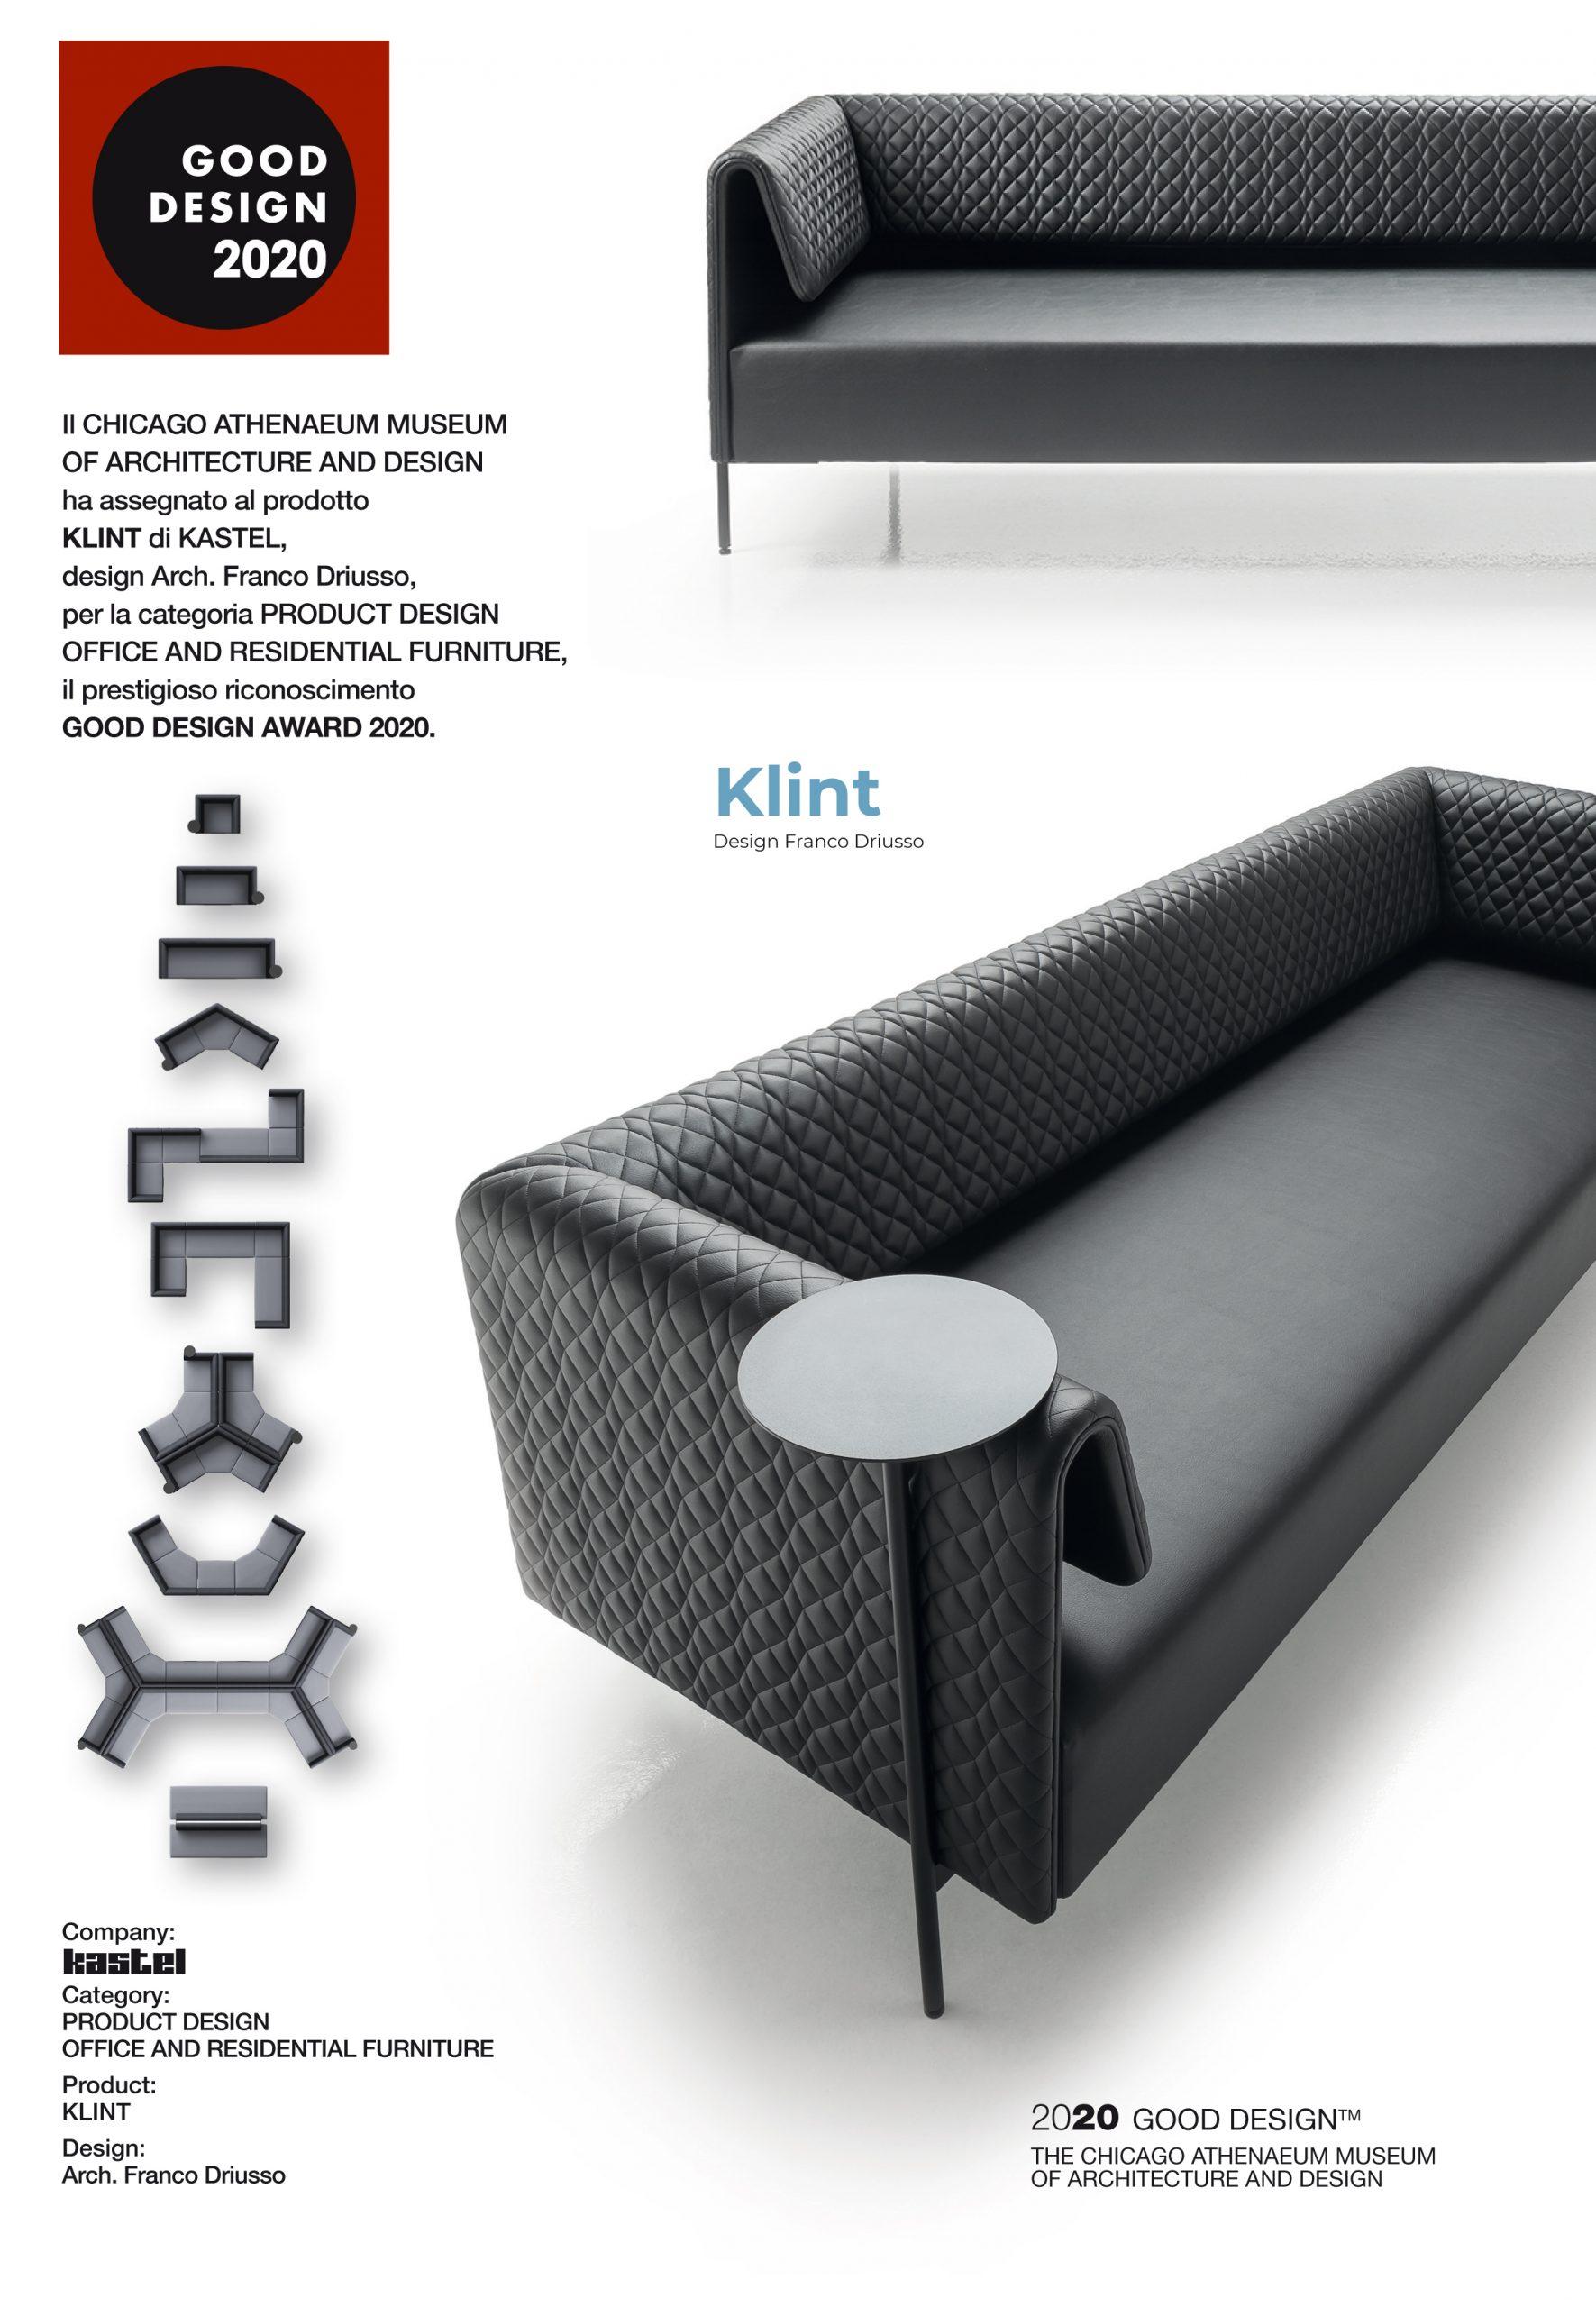 Klint: Good Design Award 2020